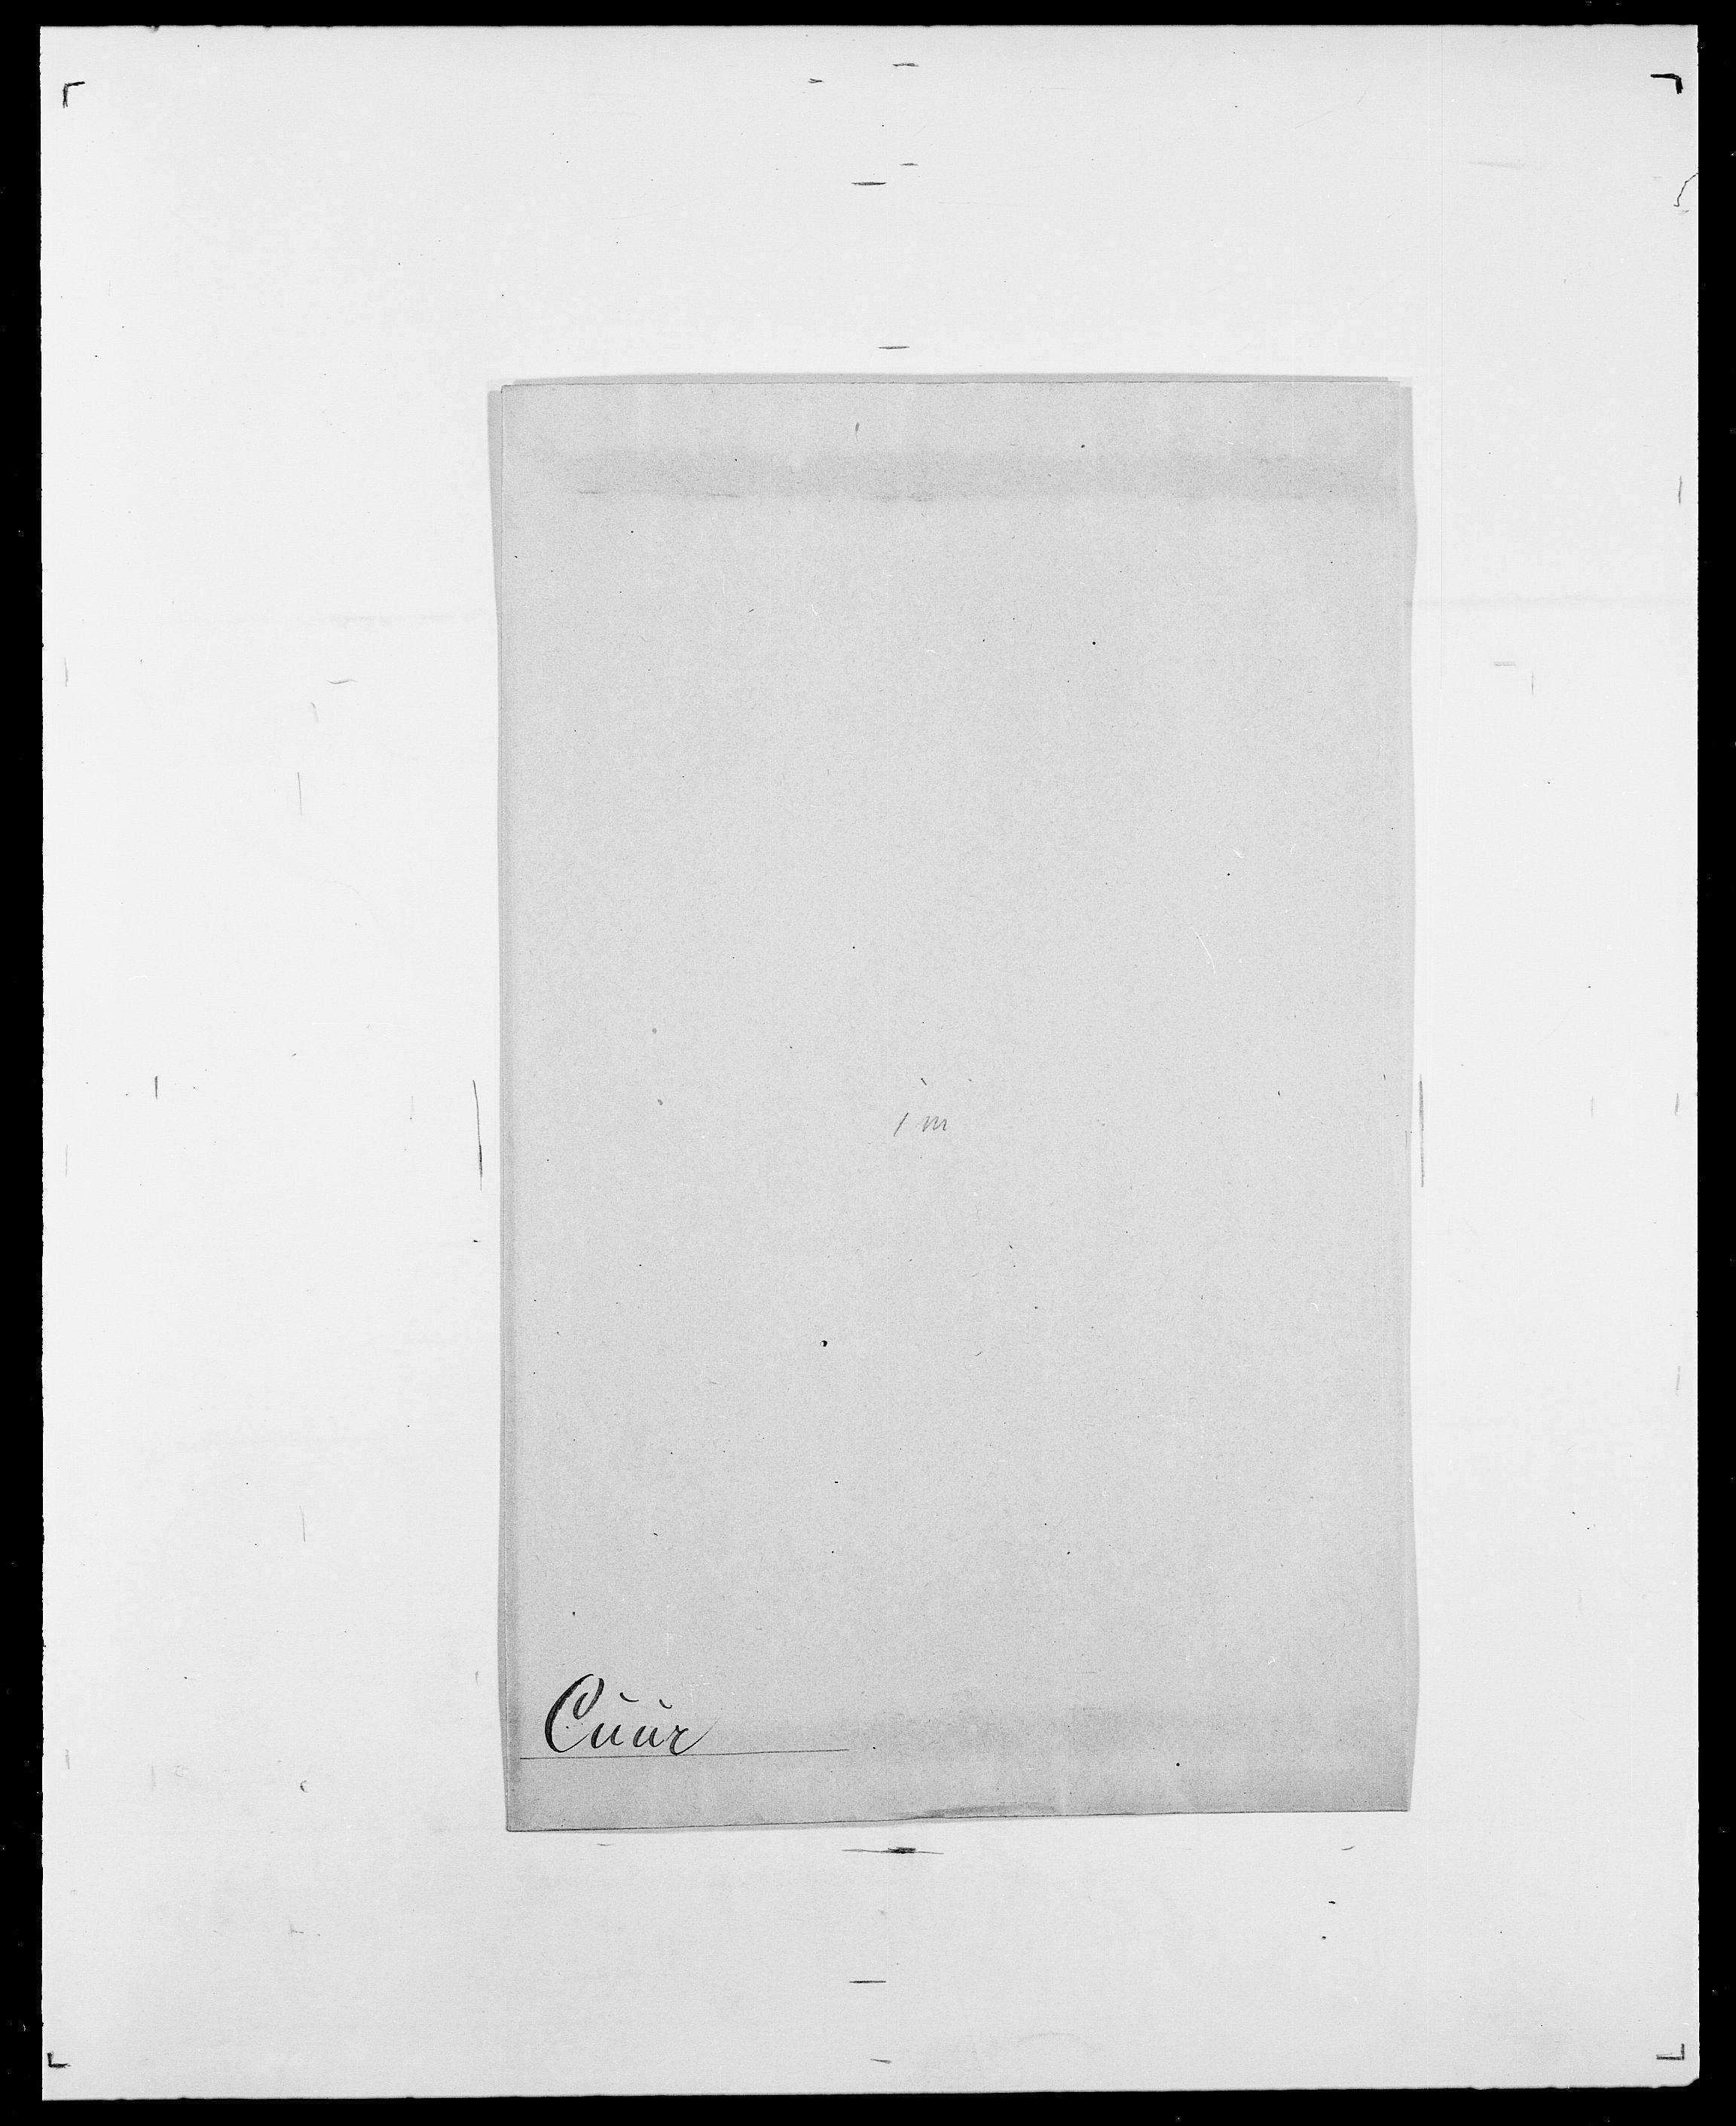 SAO, Delgobe, Charles Antoine - samling, D/Da/L0008: Capjon - Dagenbolt, s. 653